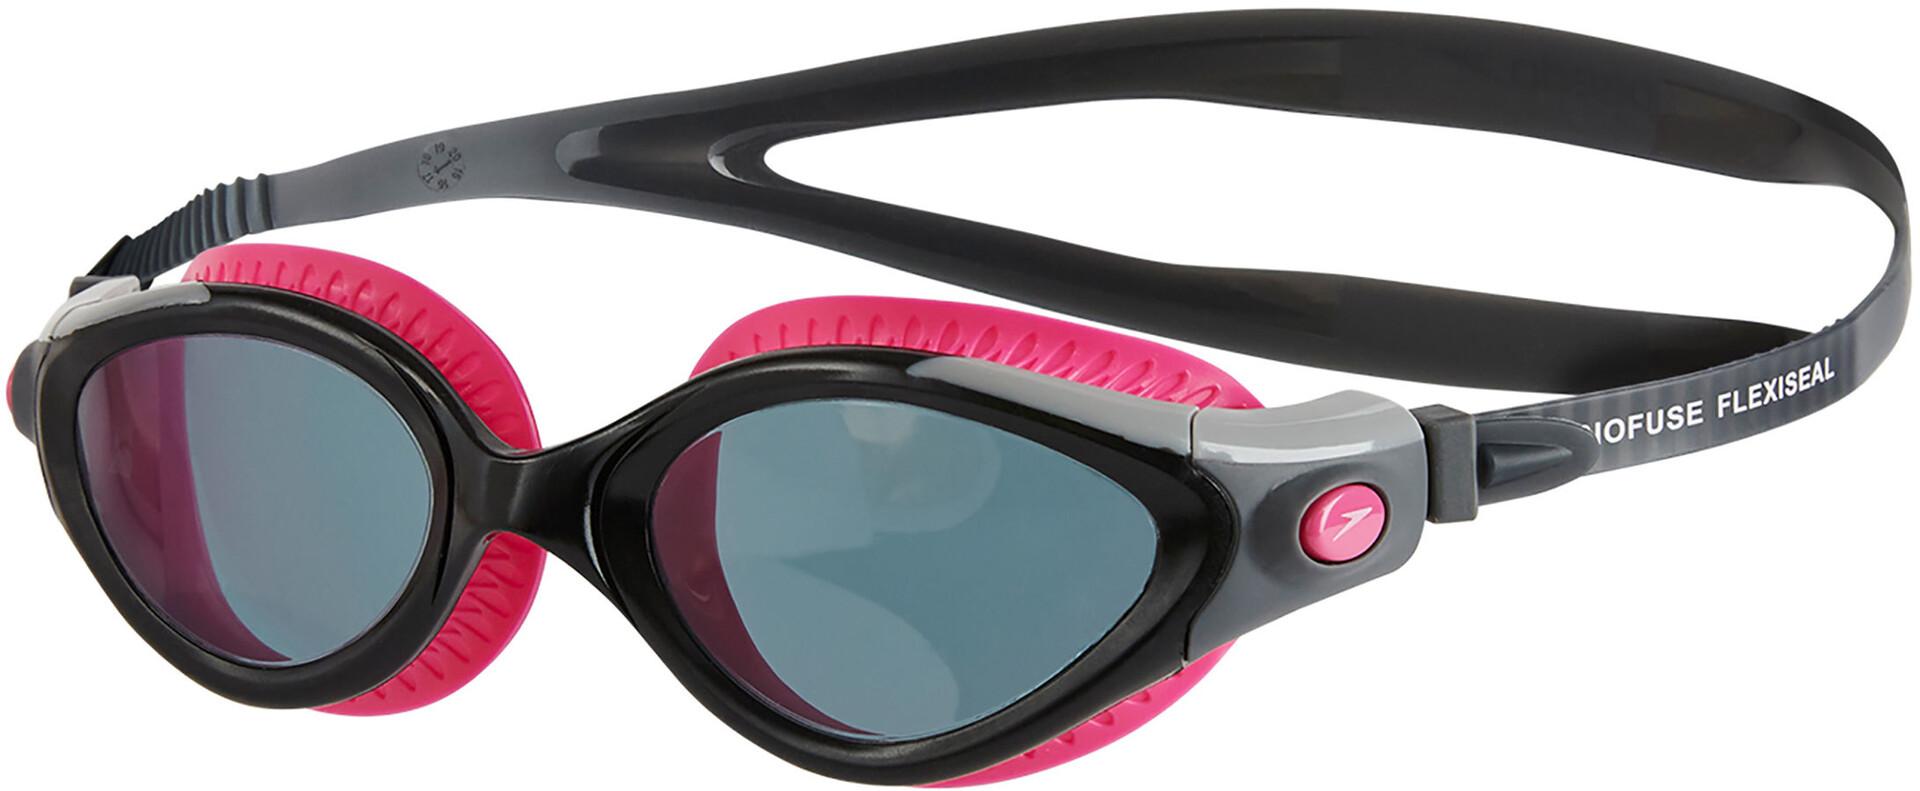 625bbd9b7 Accesorios Speedo Futura Biofuse Flexiseal Gafas de Natación Mujer